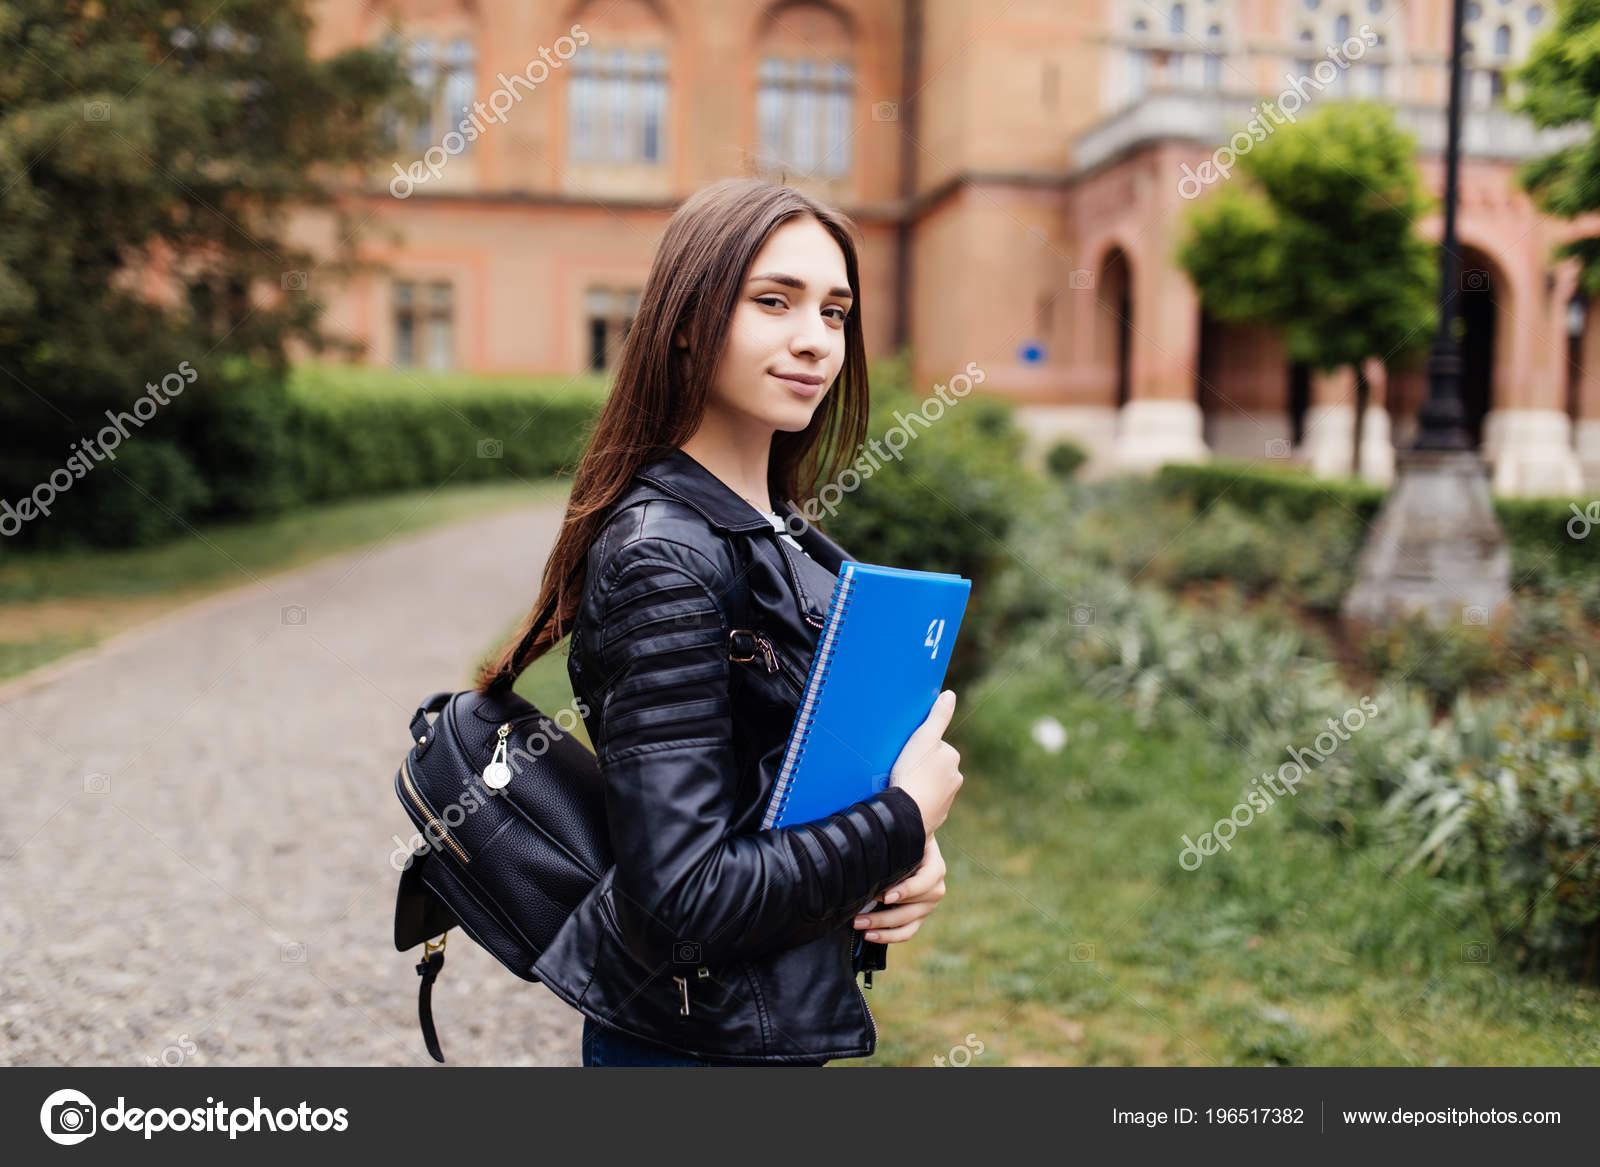 University College Student Girl Looking Happy Smiling Book Notebook Campus  — Stock Photo © dan.grytsku.gmail.com #196517382